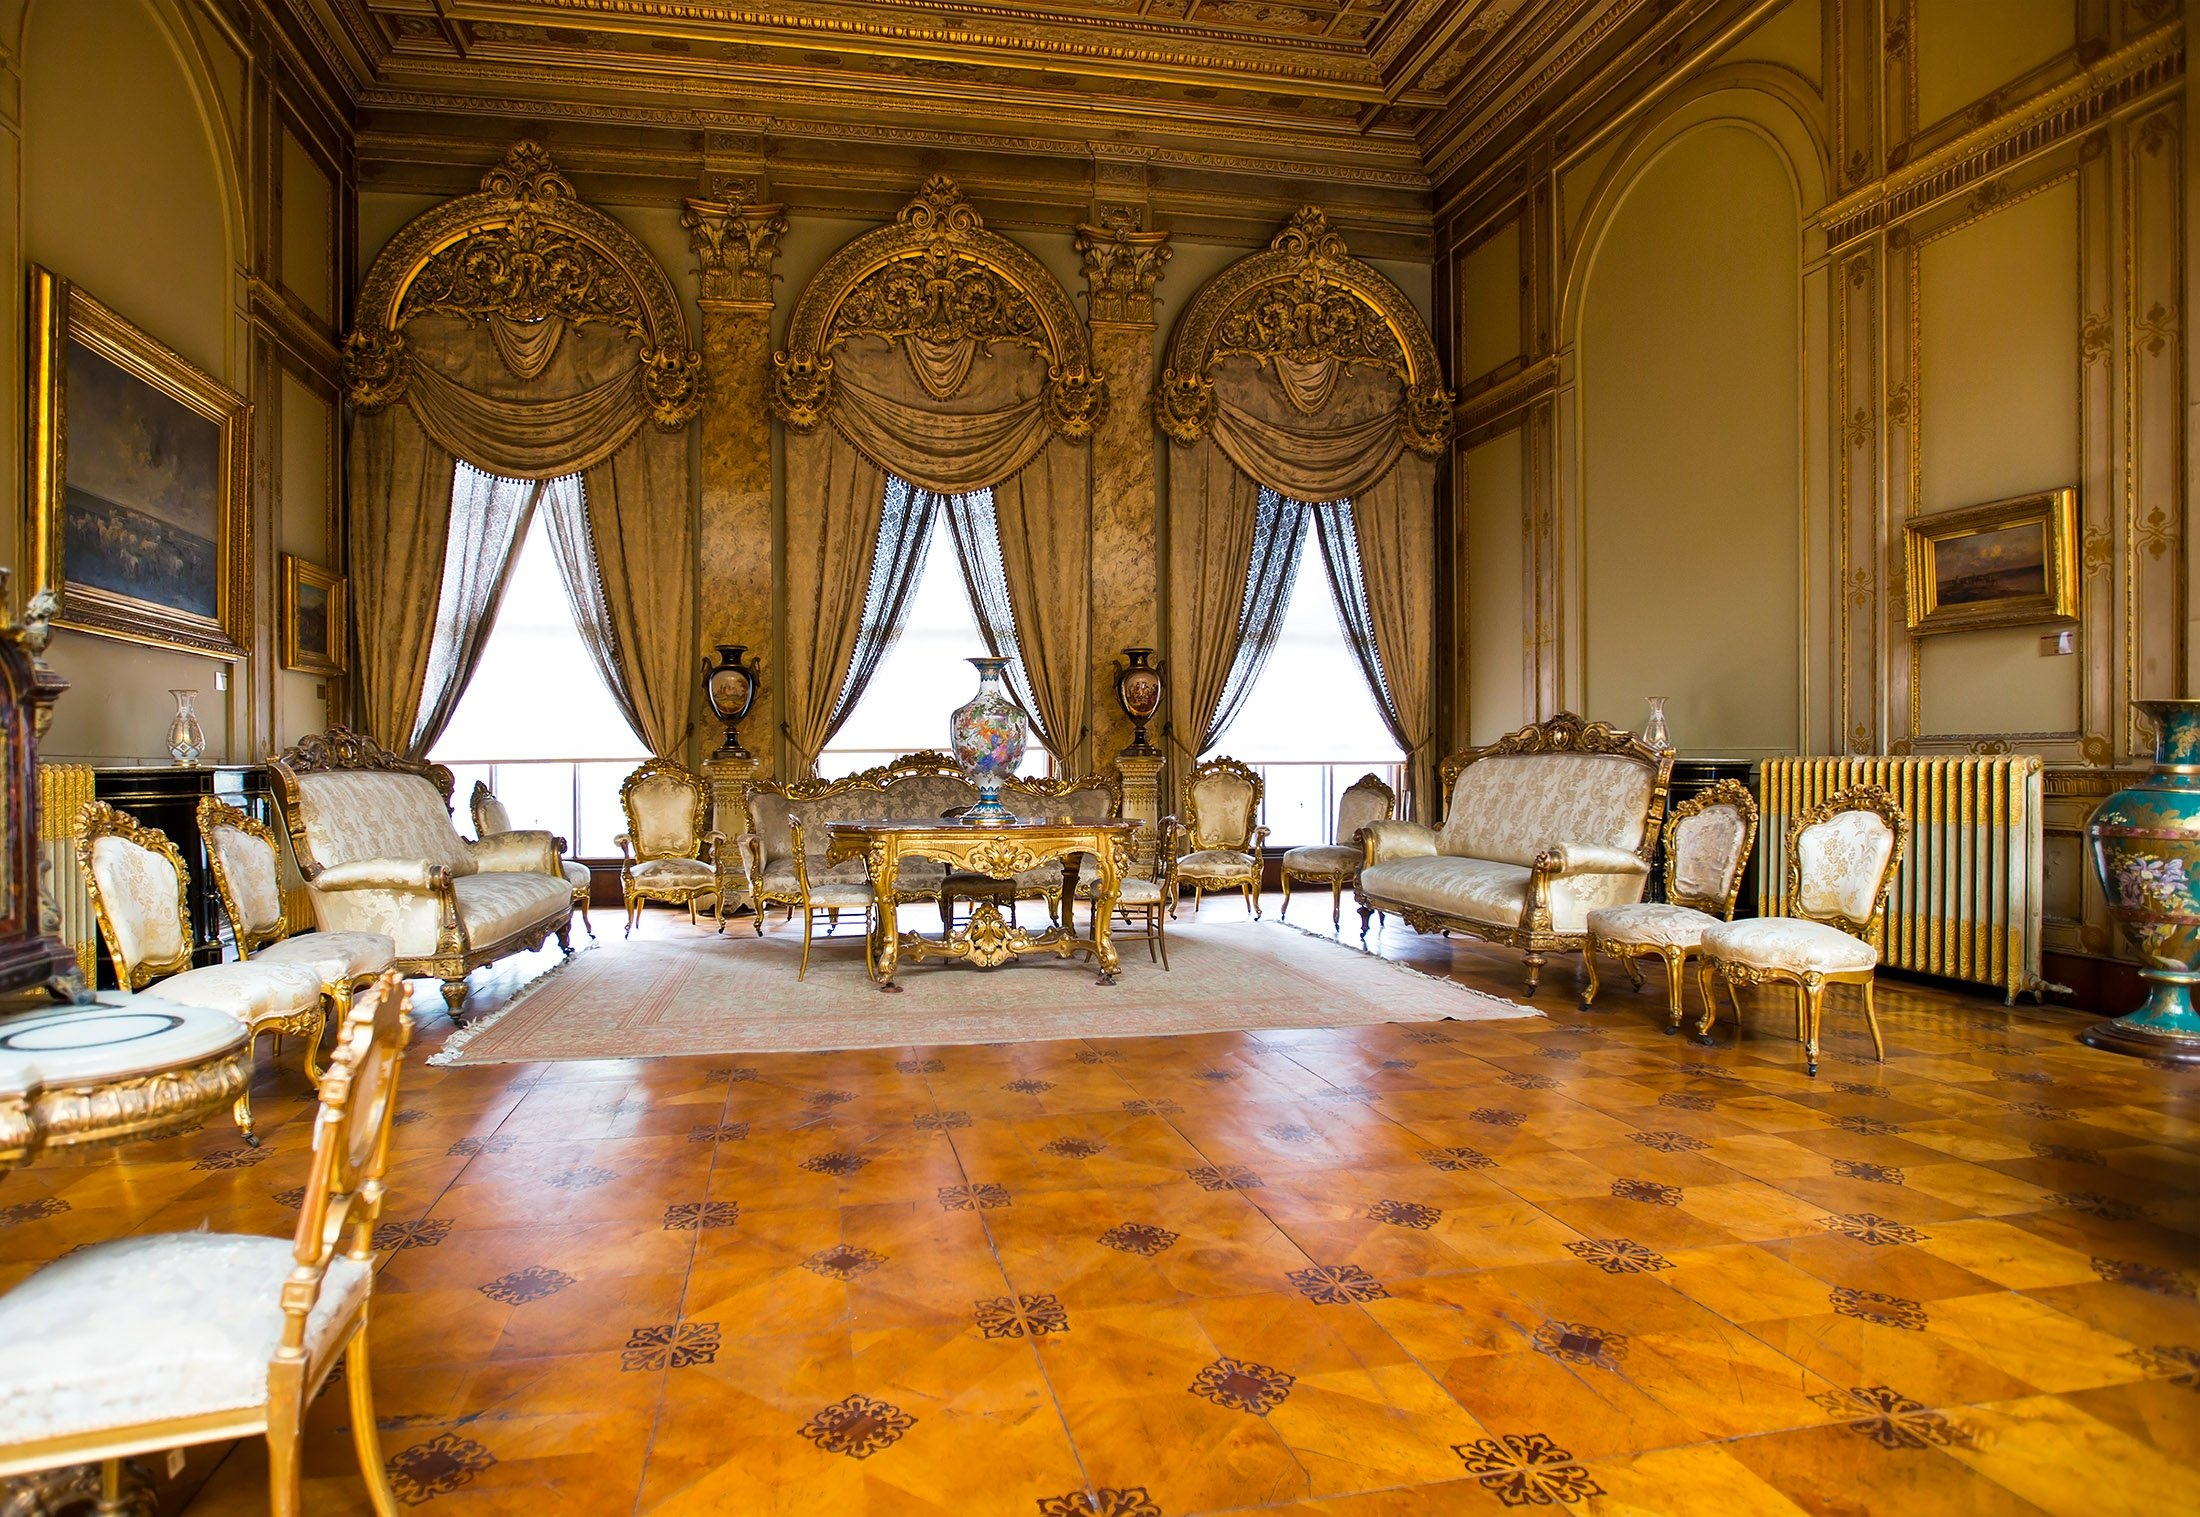 Dolmabahçe Palace interior. (Shutterstock Photo)